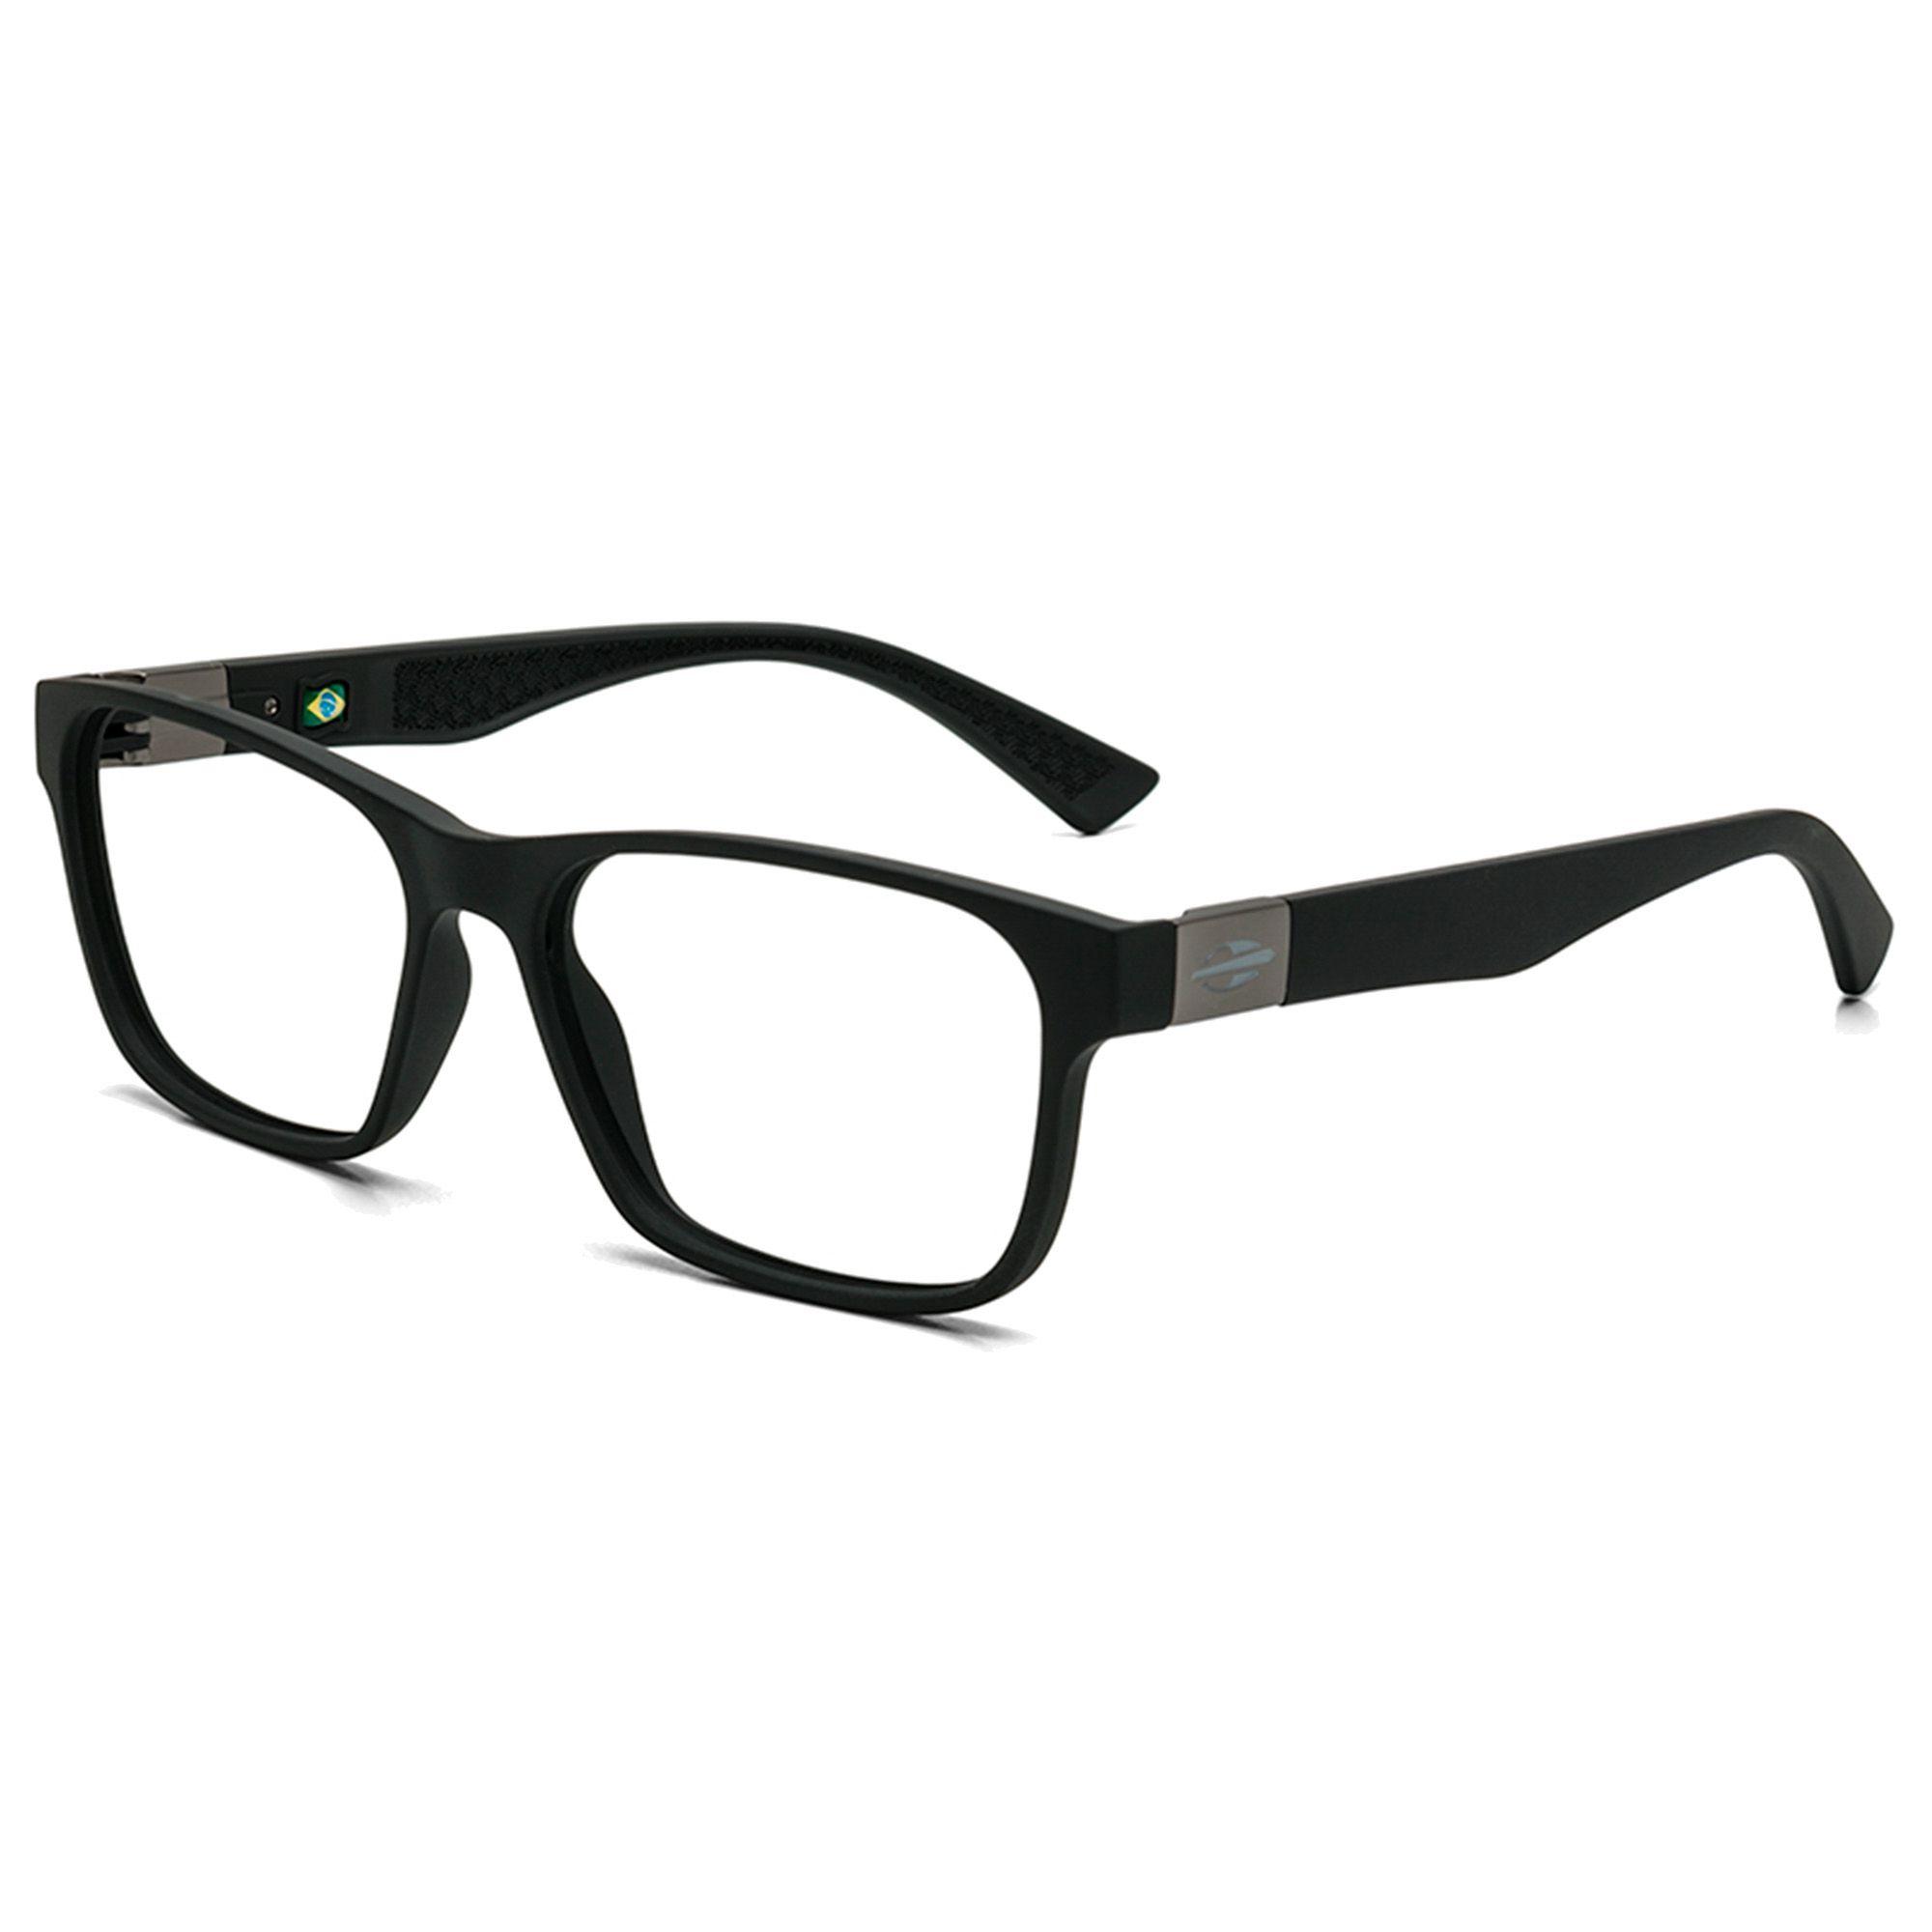 Óculos de Grau Unissex Mormaii Seul M6074A1454